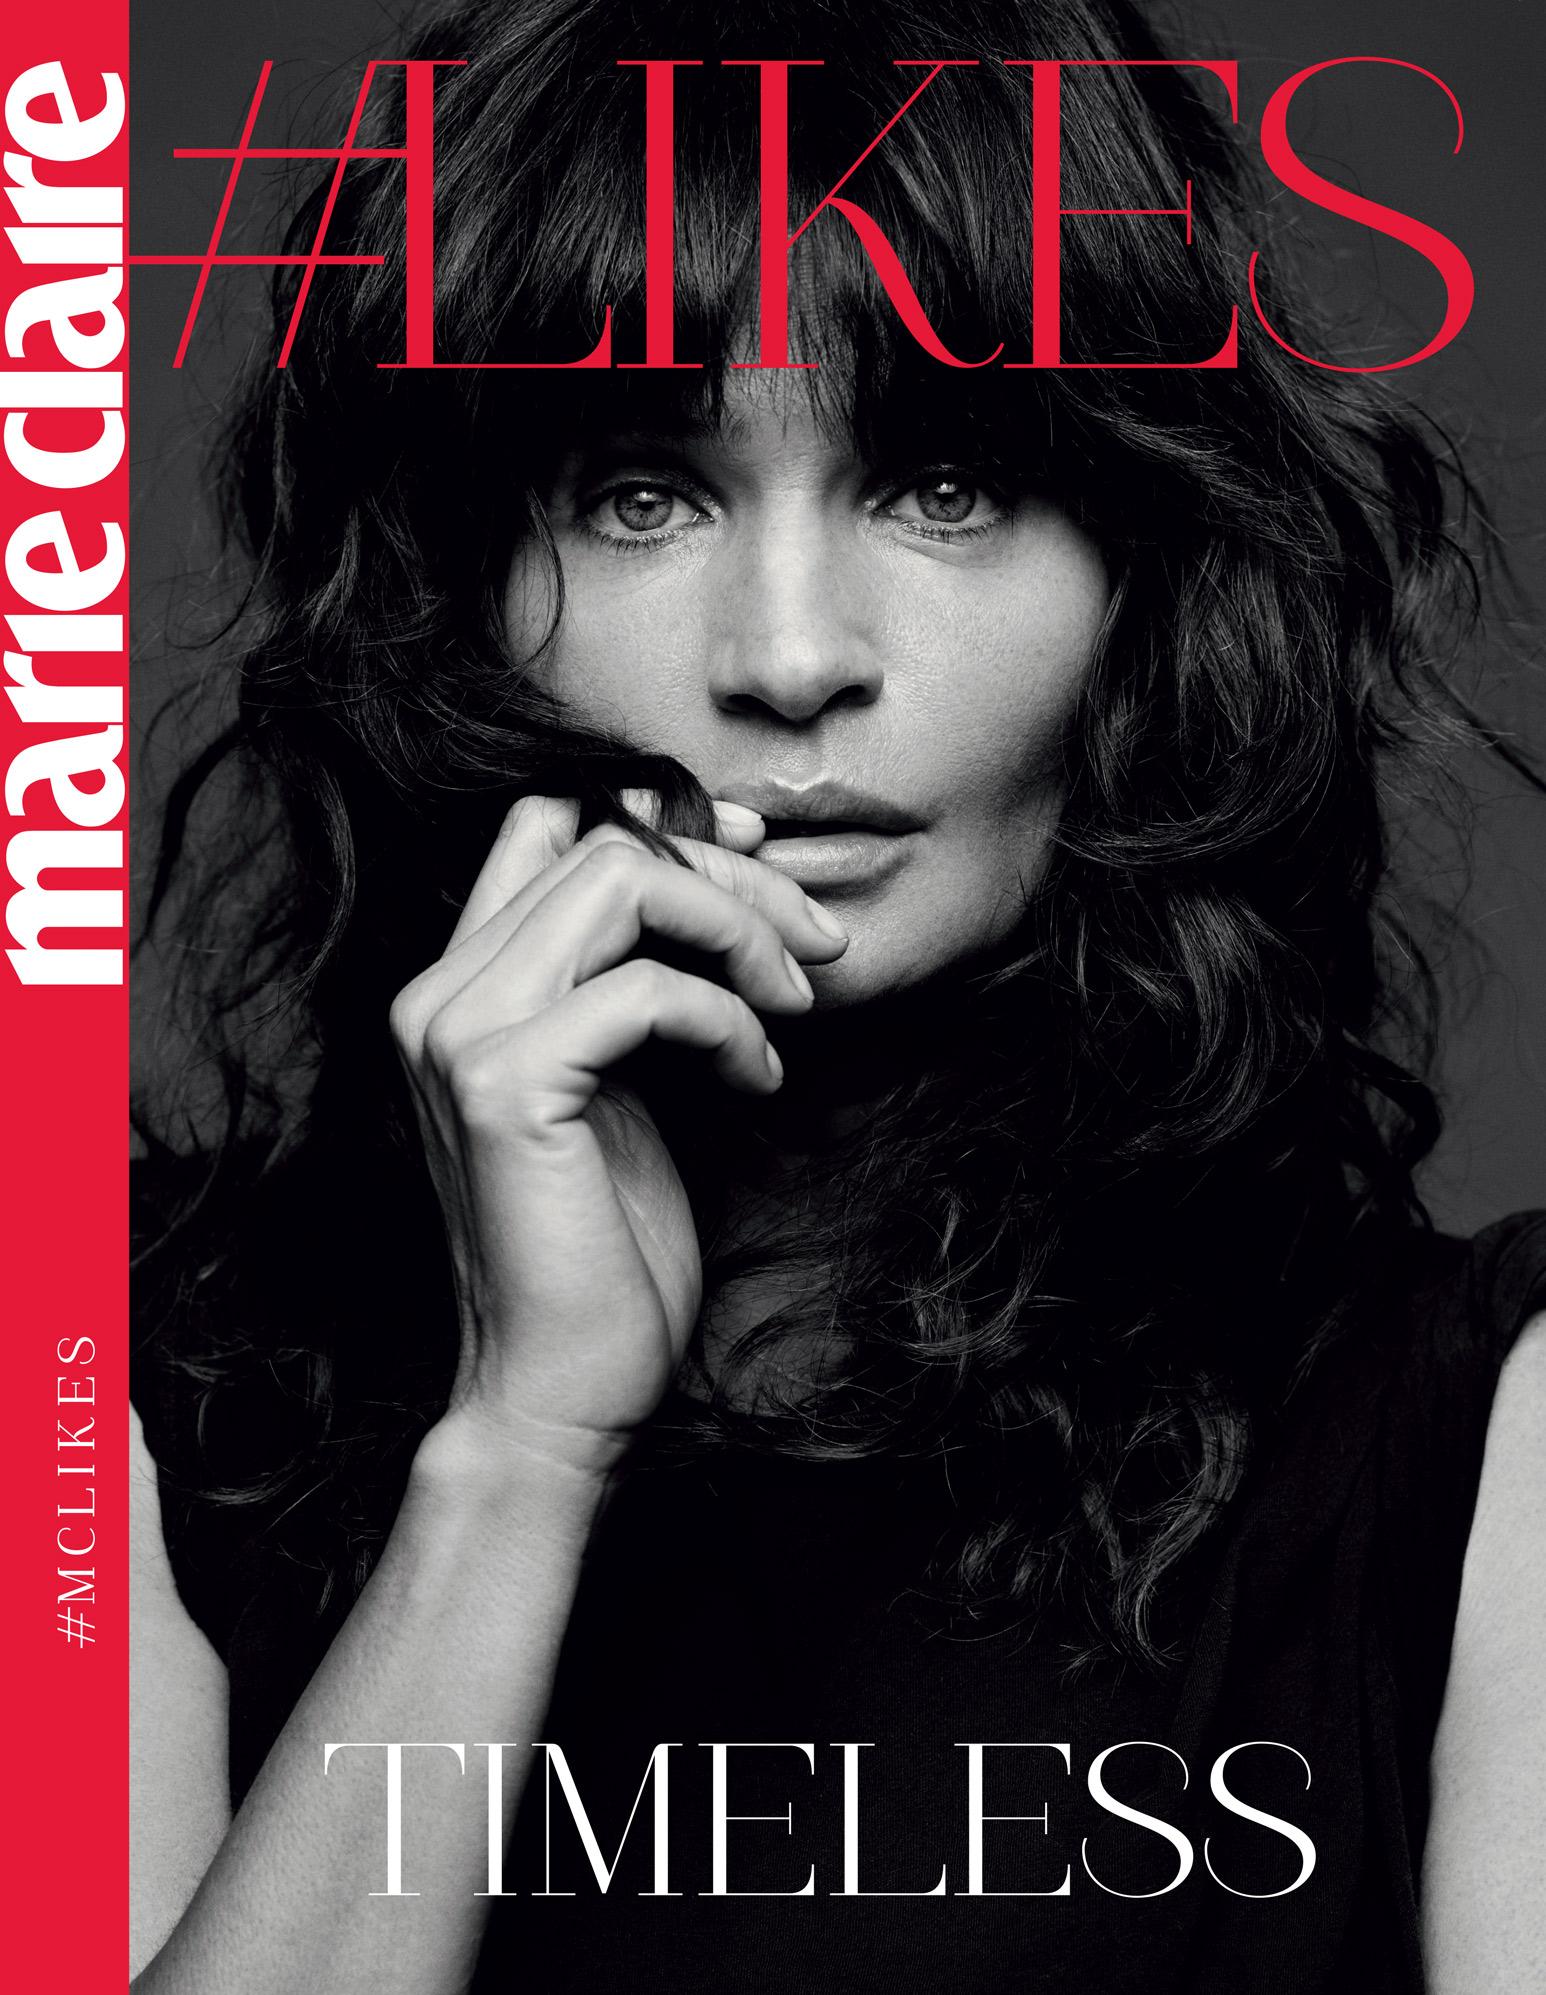 MCLIKES-cover-HELENA.jpg